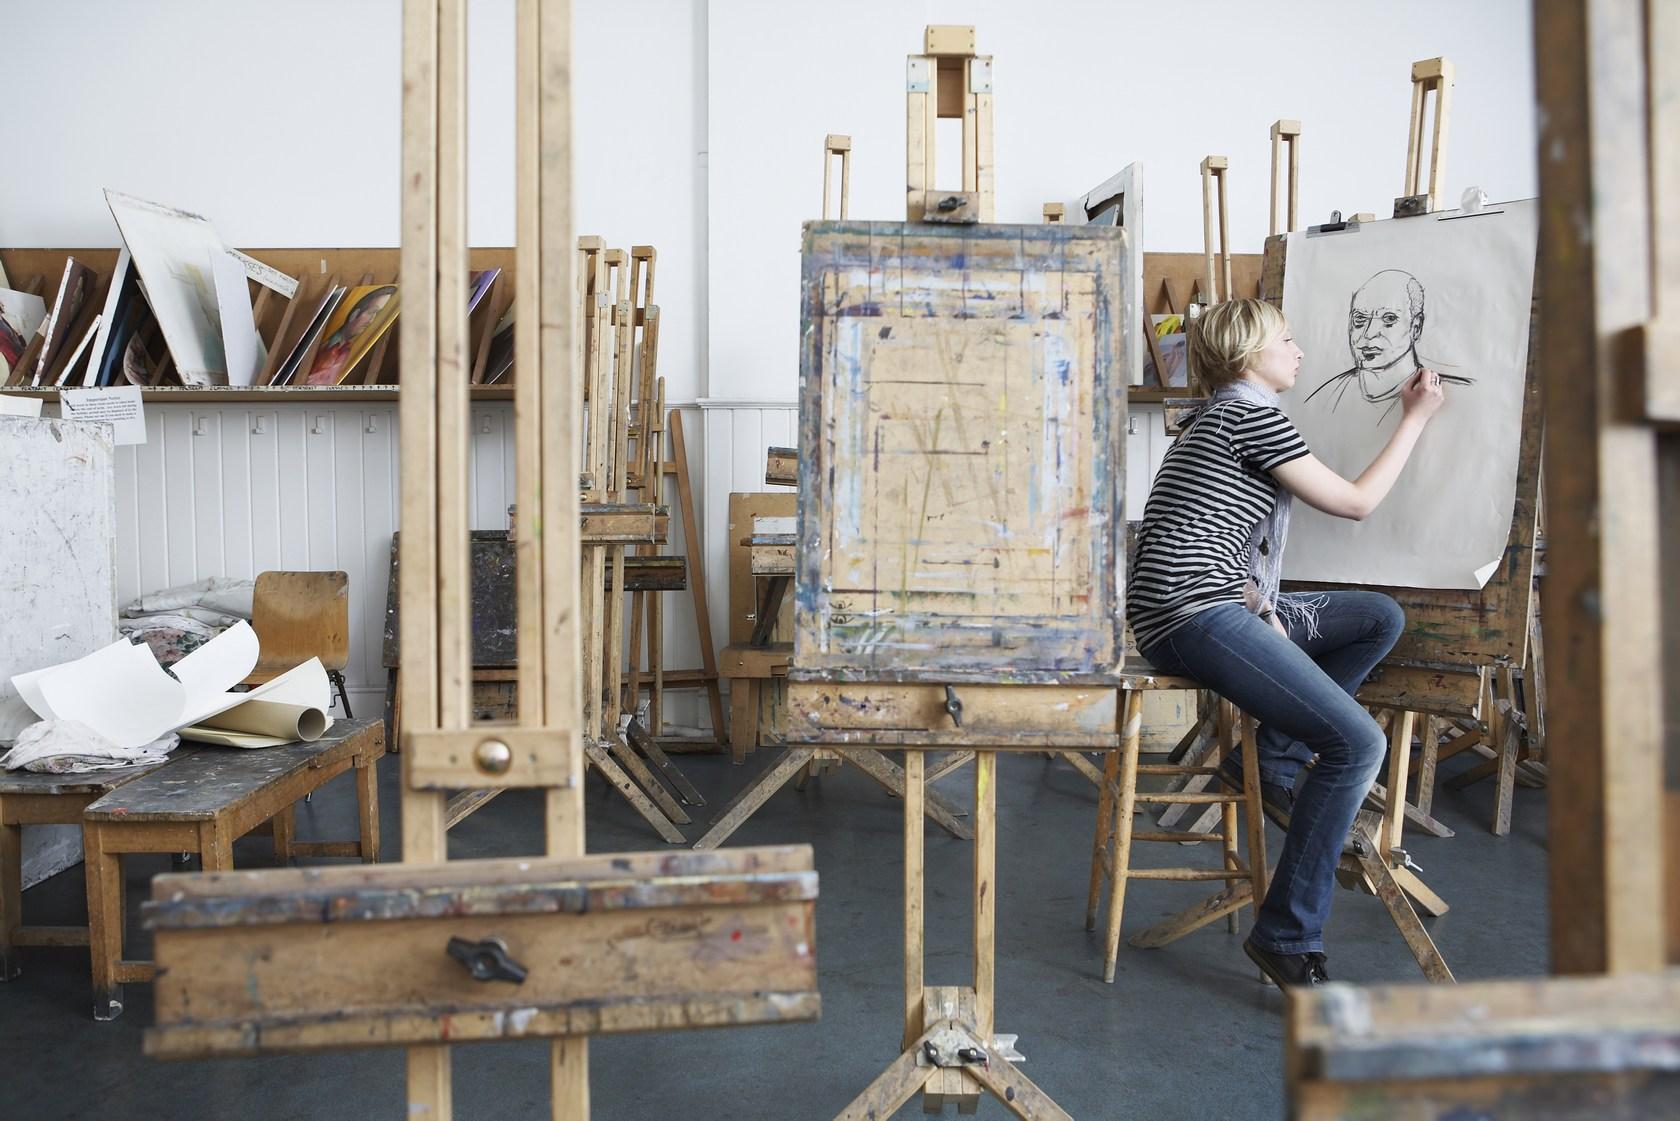 Kunst-Rand-Bild_71_1680_1050